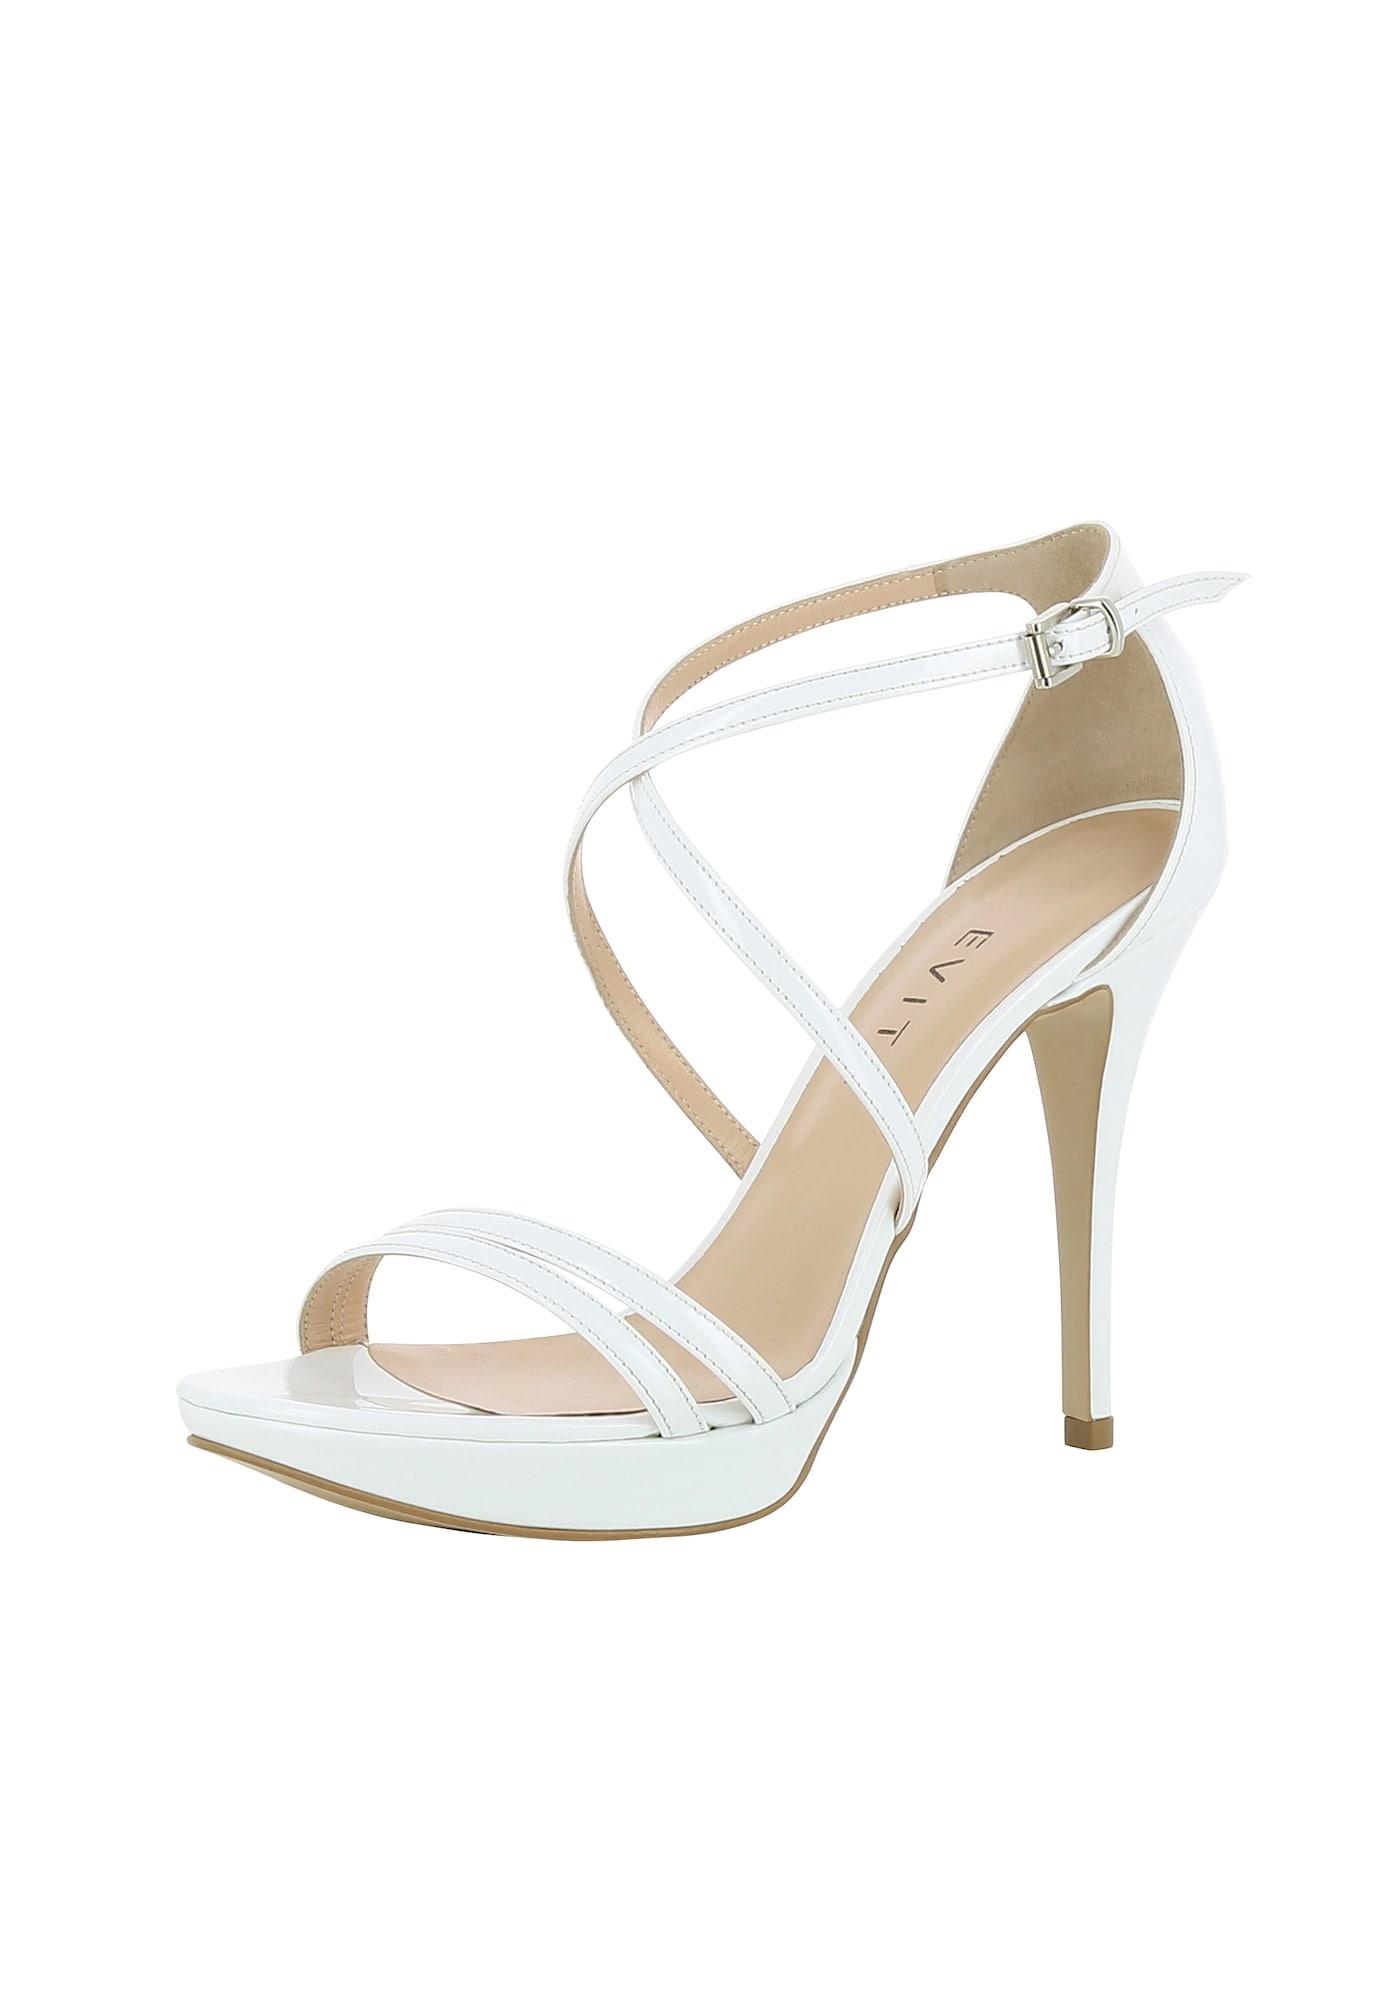 Sandalette 'Valeria' | Schuhe | EVITA